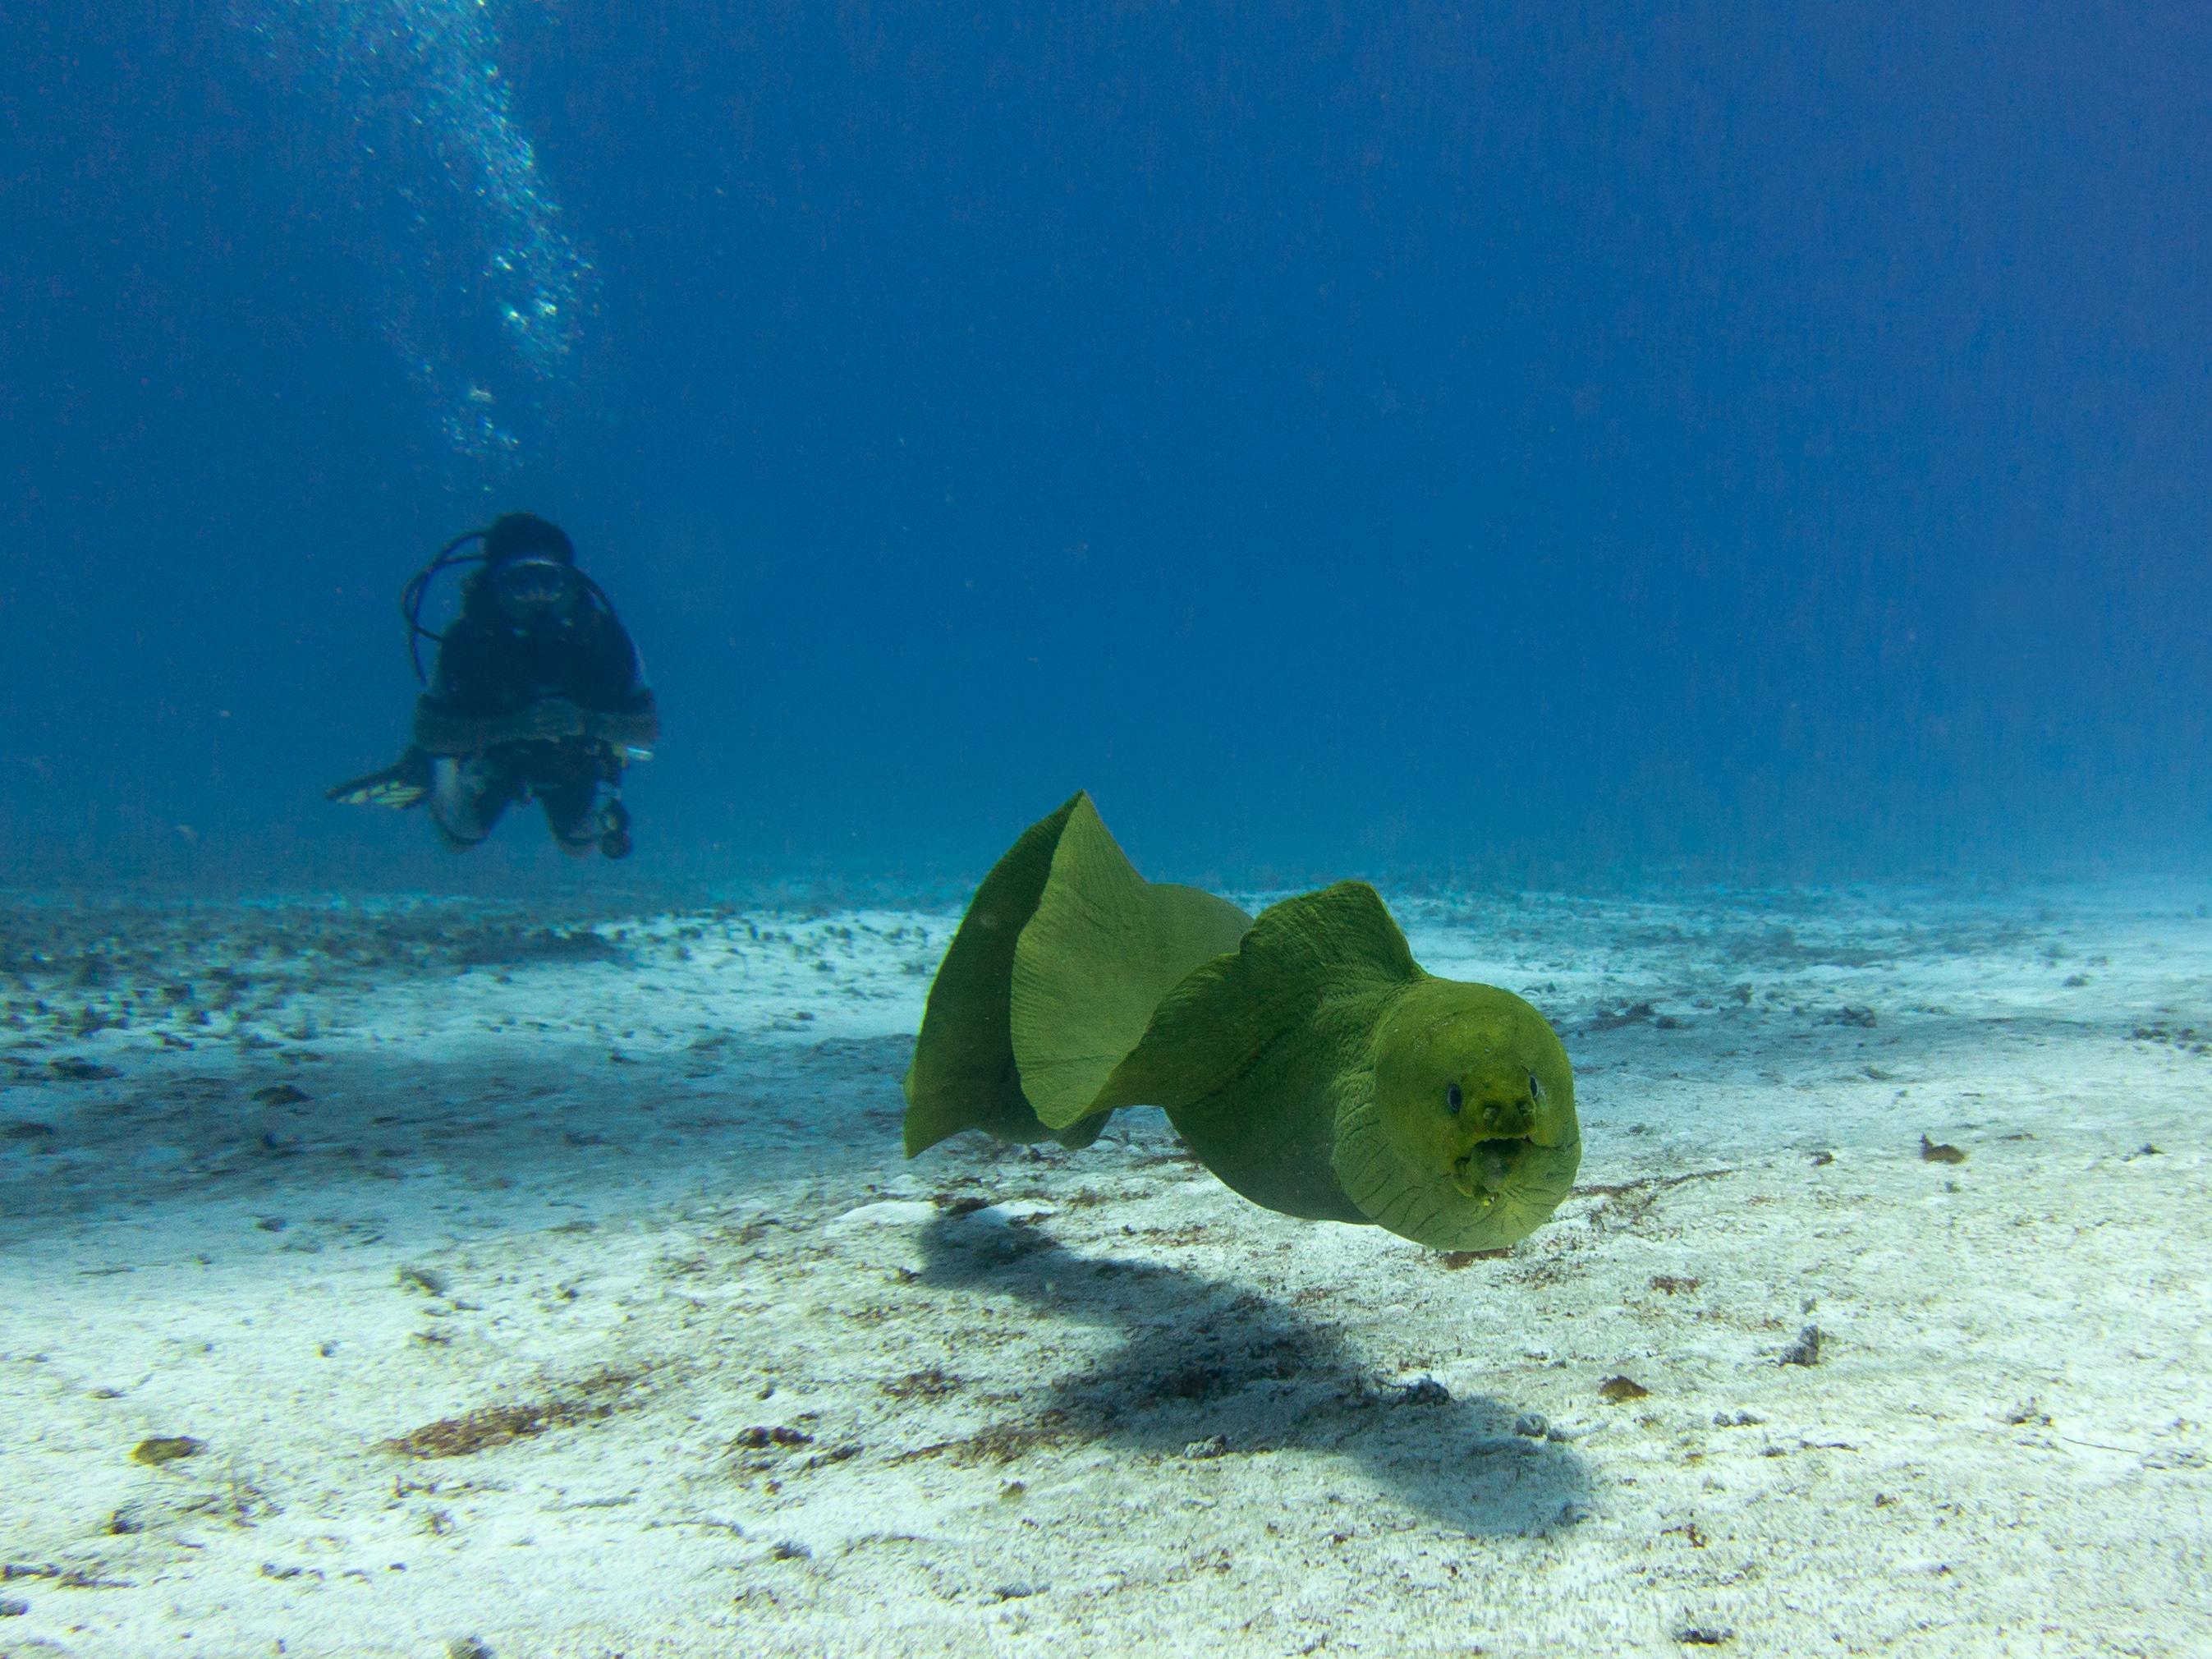 filegreen moray eel gymnothorax funebris cozumeljpg